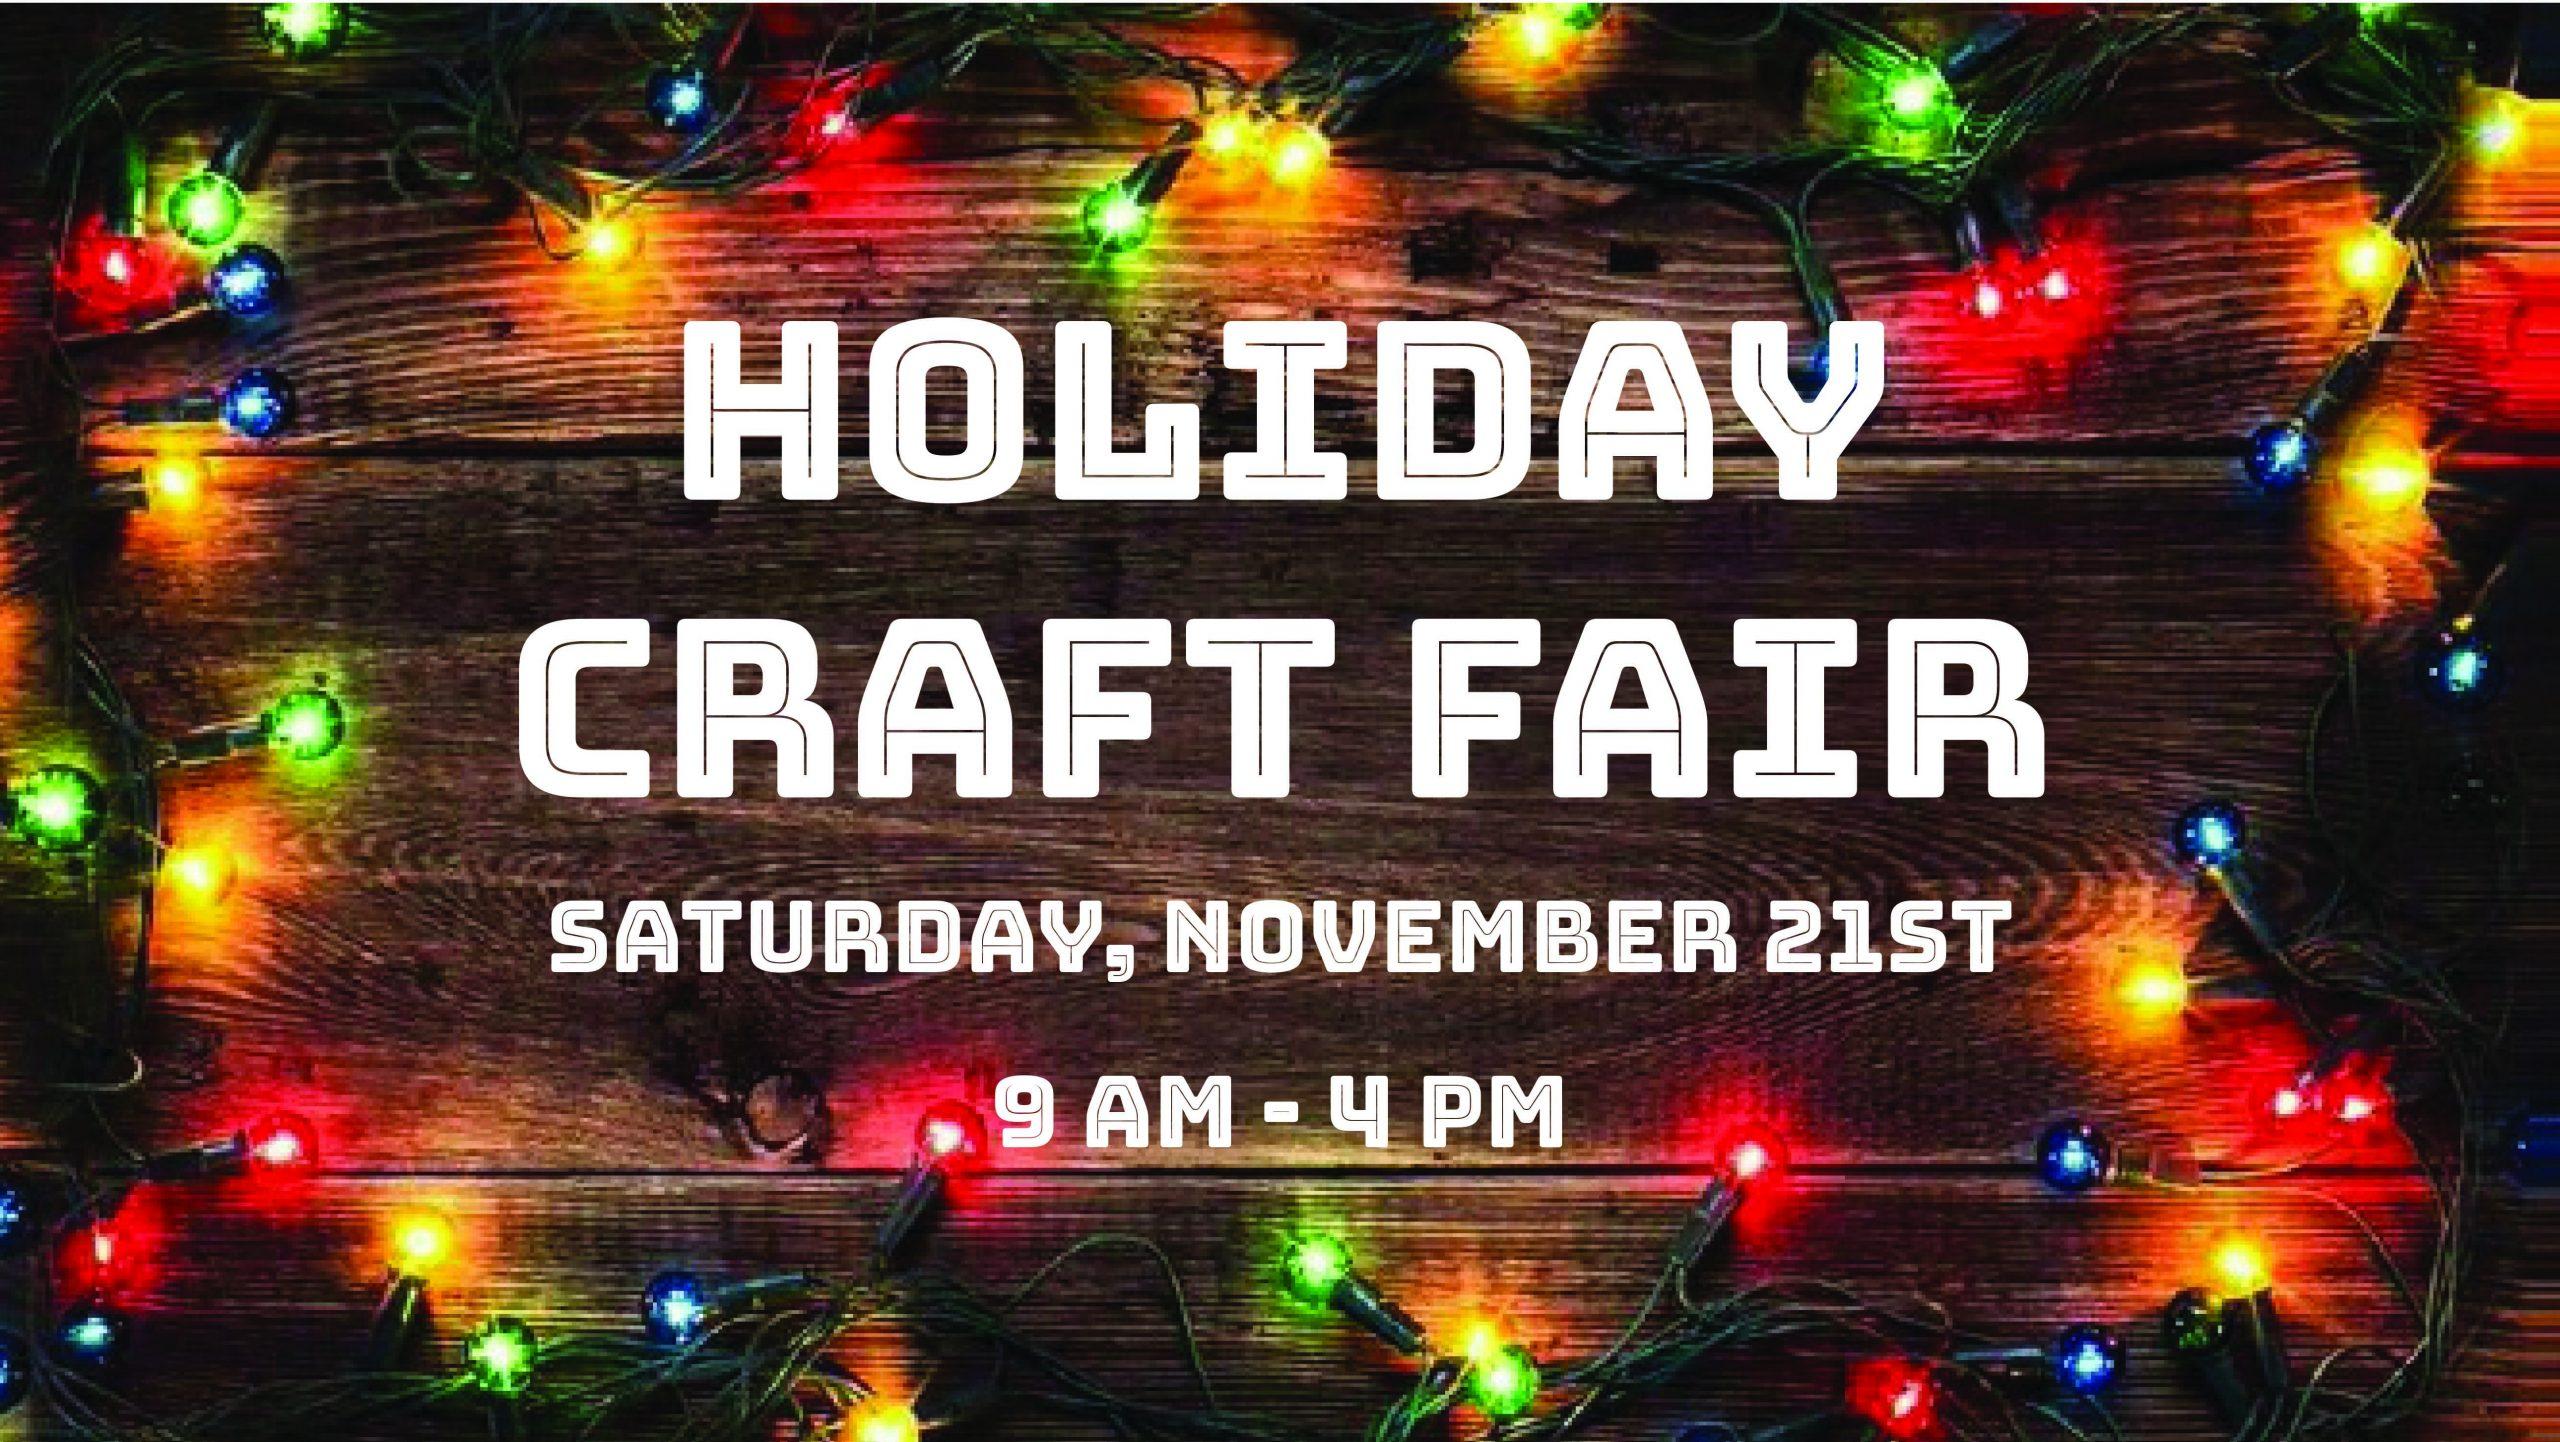 Christmas Craft Fairs 2020 Holiday Craft Fair of Washington County   Washington County Fair